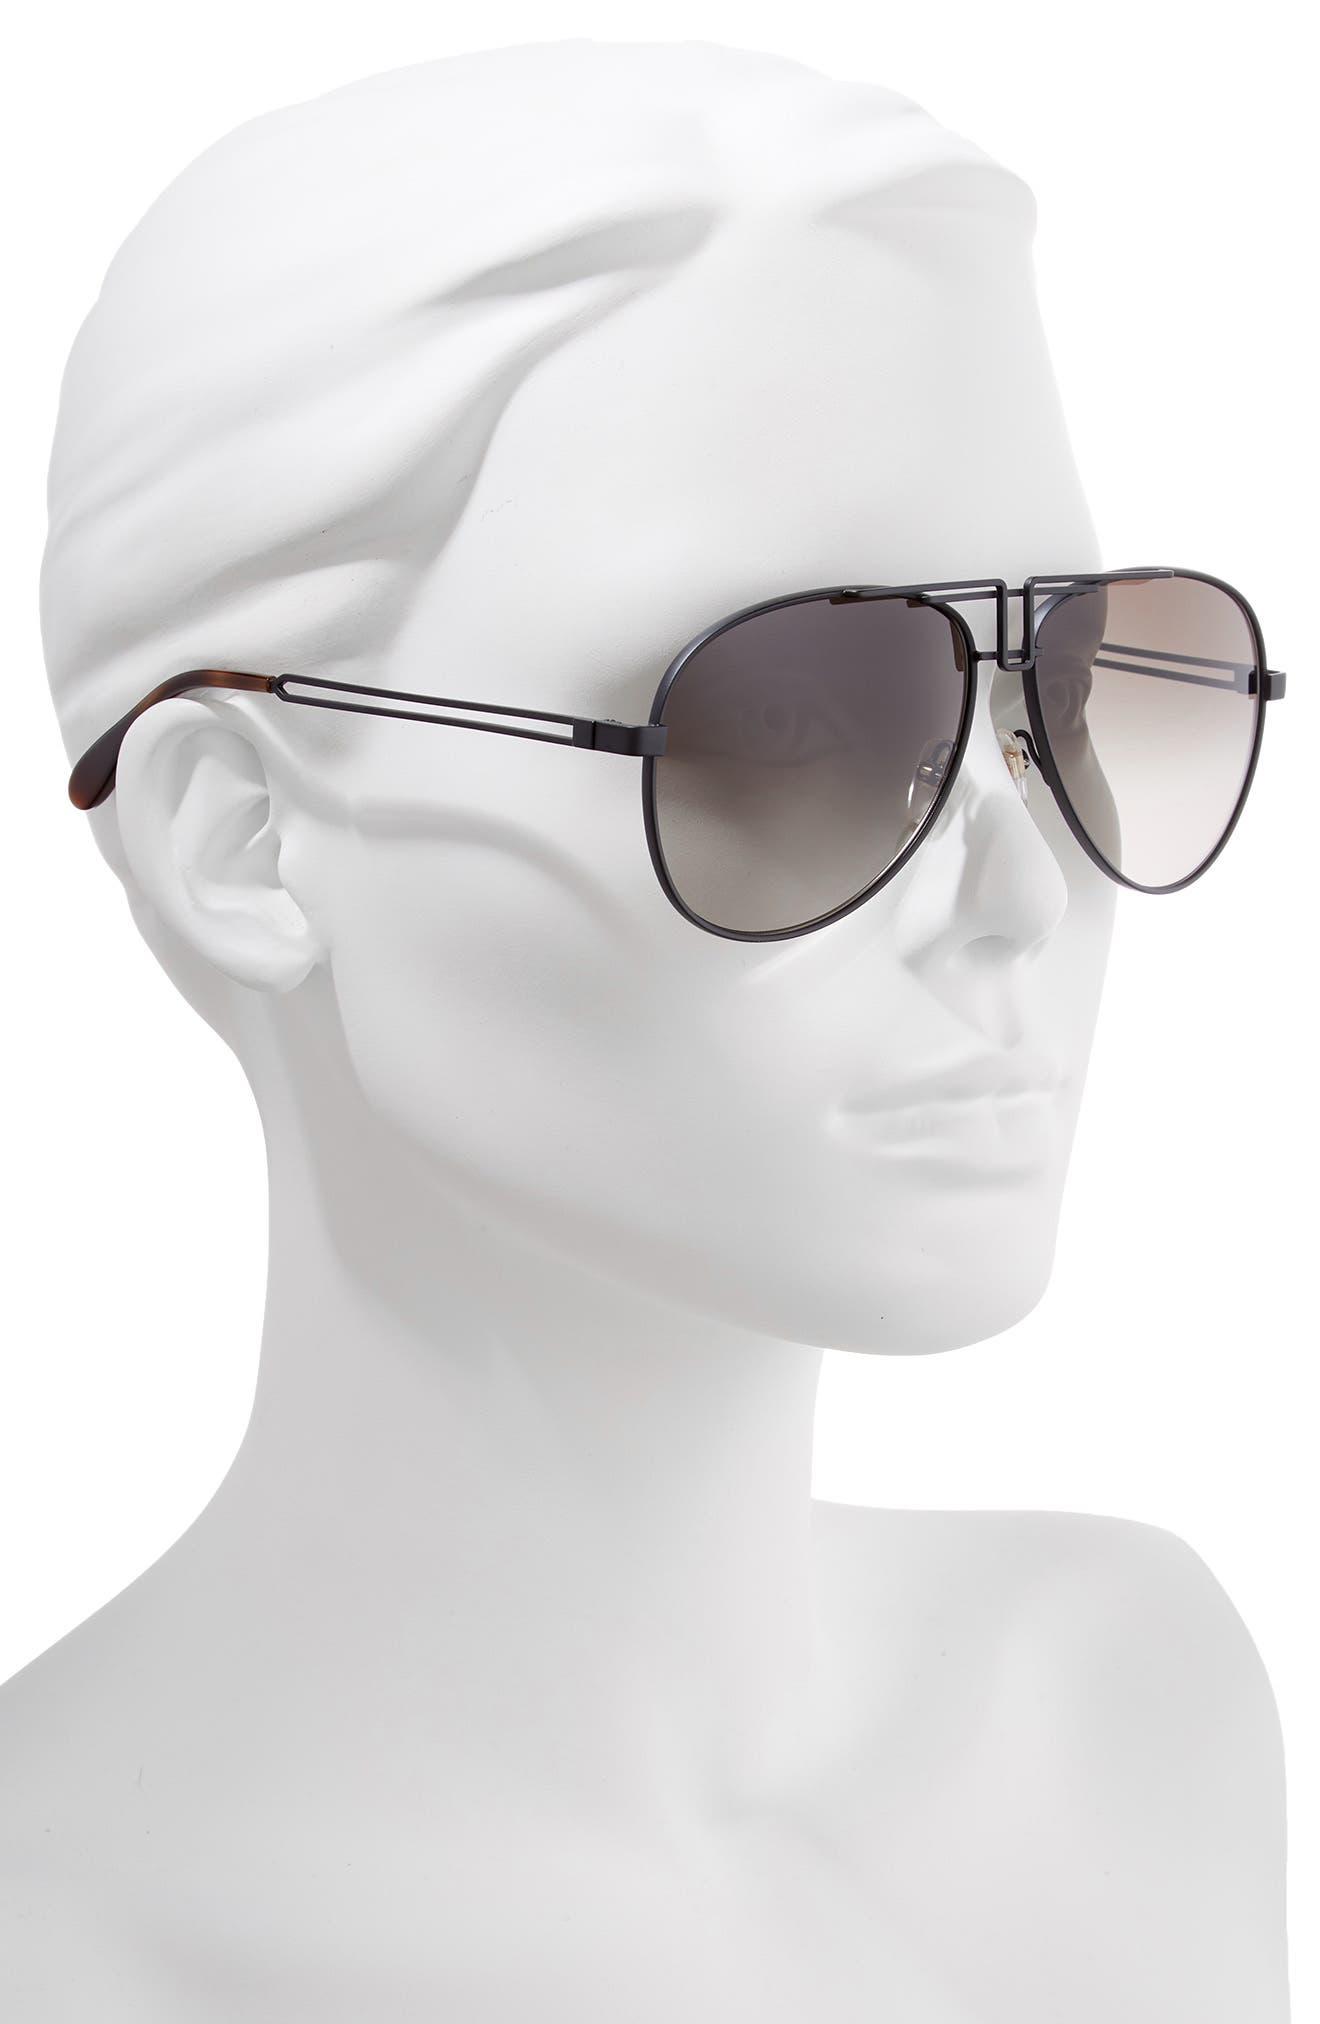 61mm Aviator Sunglasses,                             Alternate thumbnail 2, color,                             MATTE BLACK